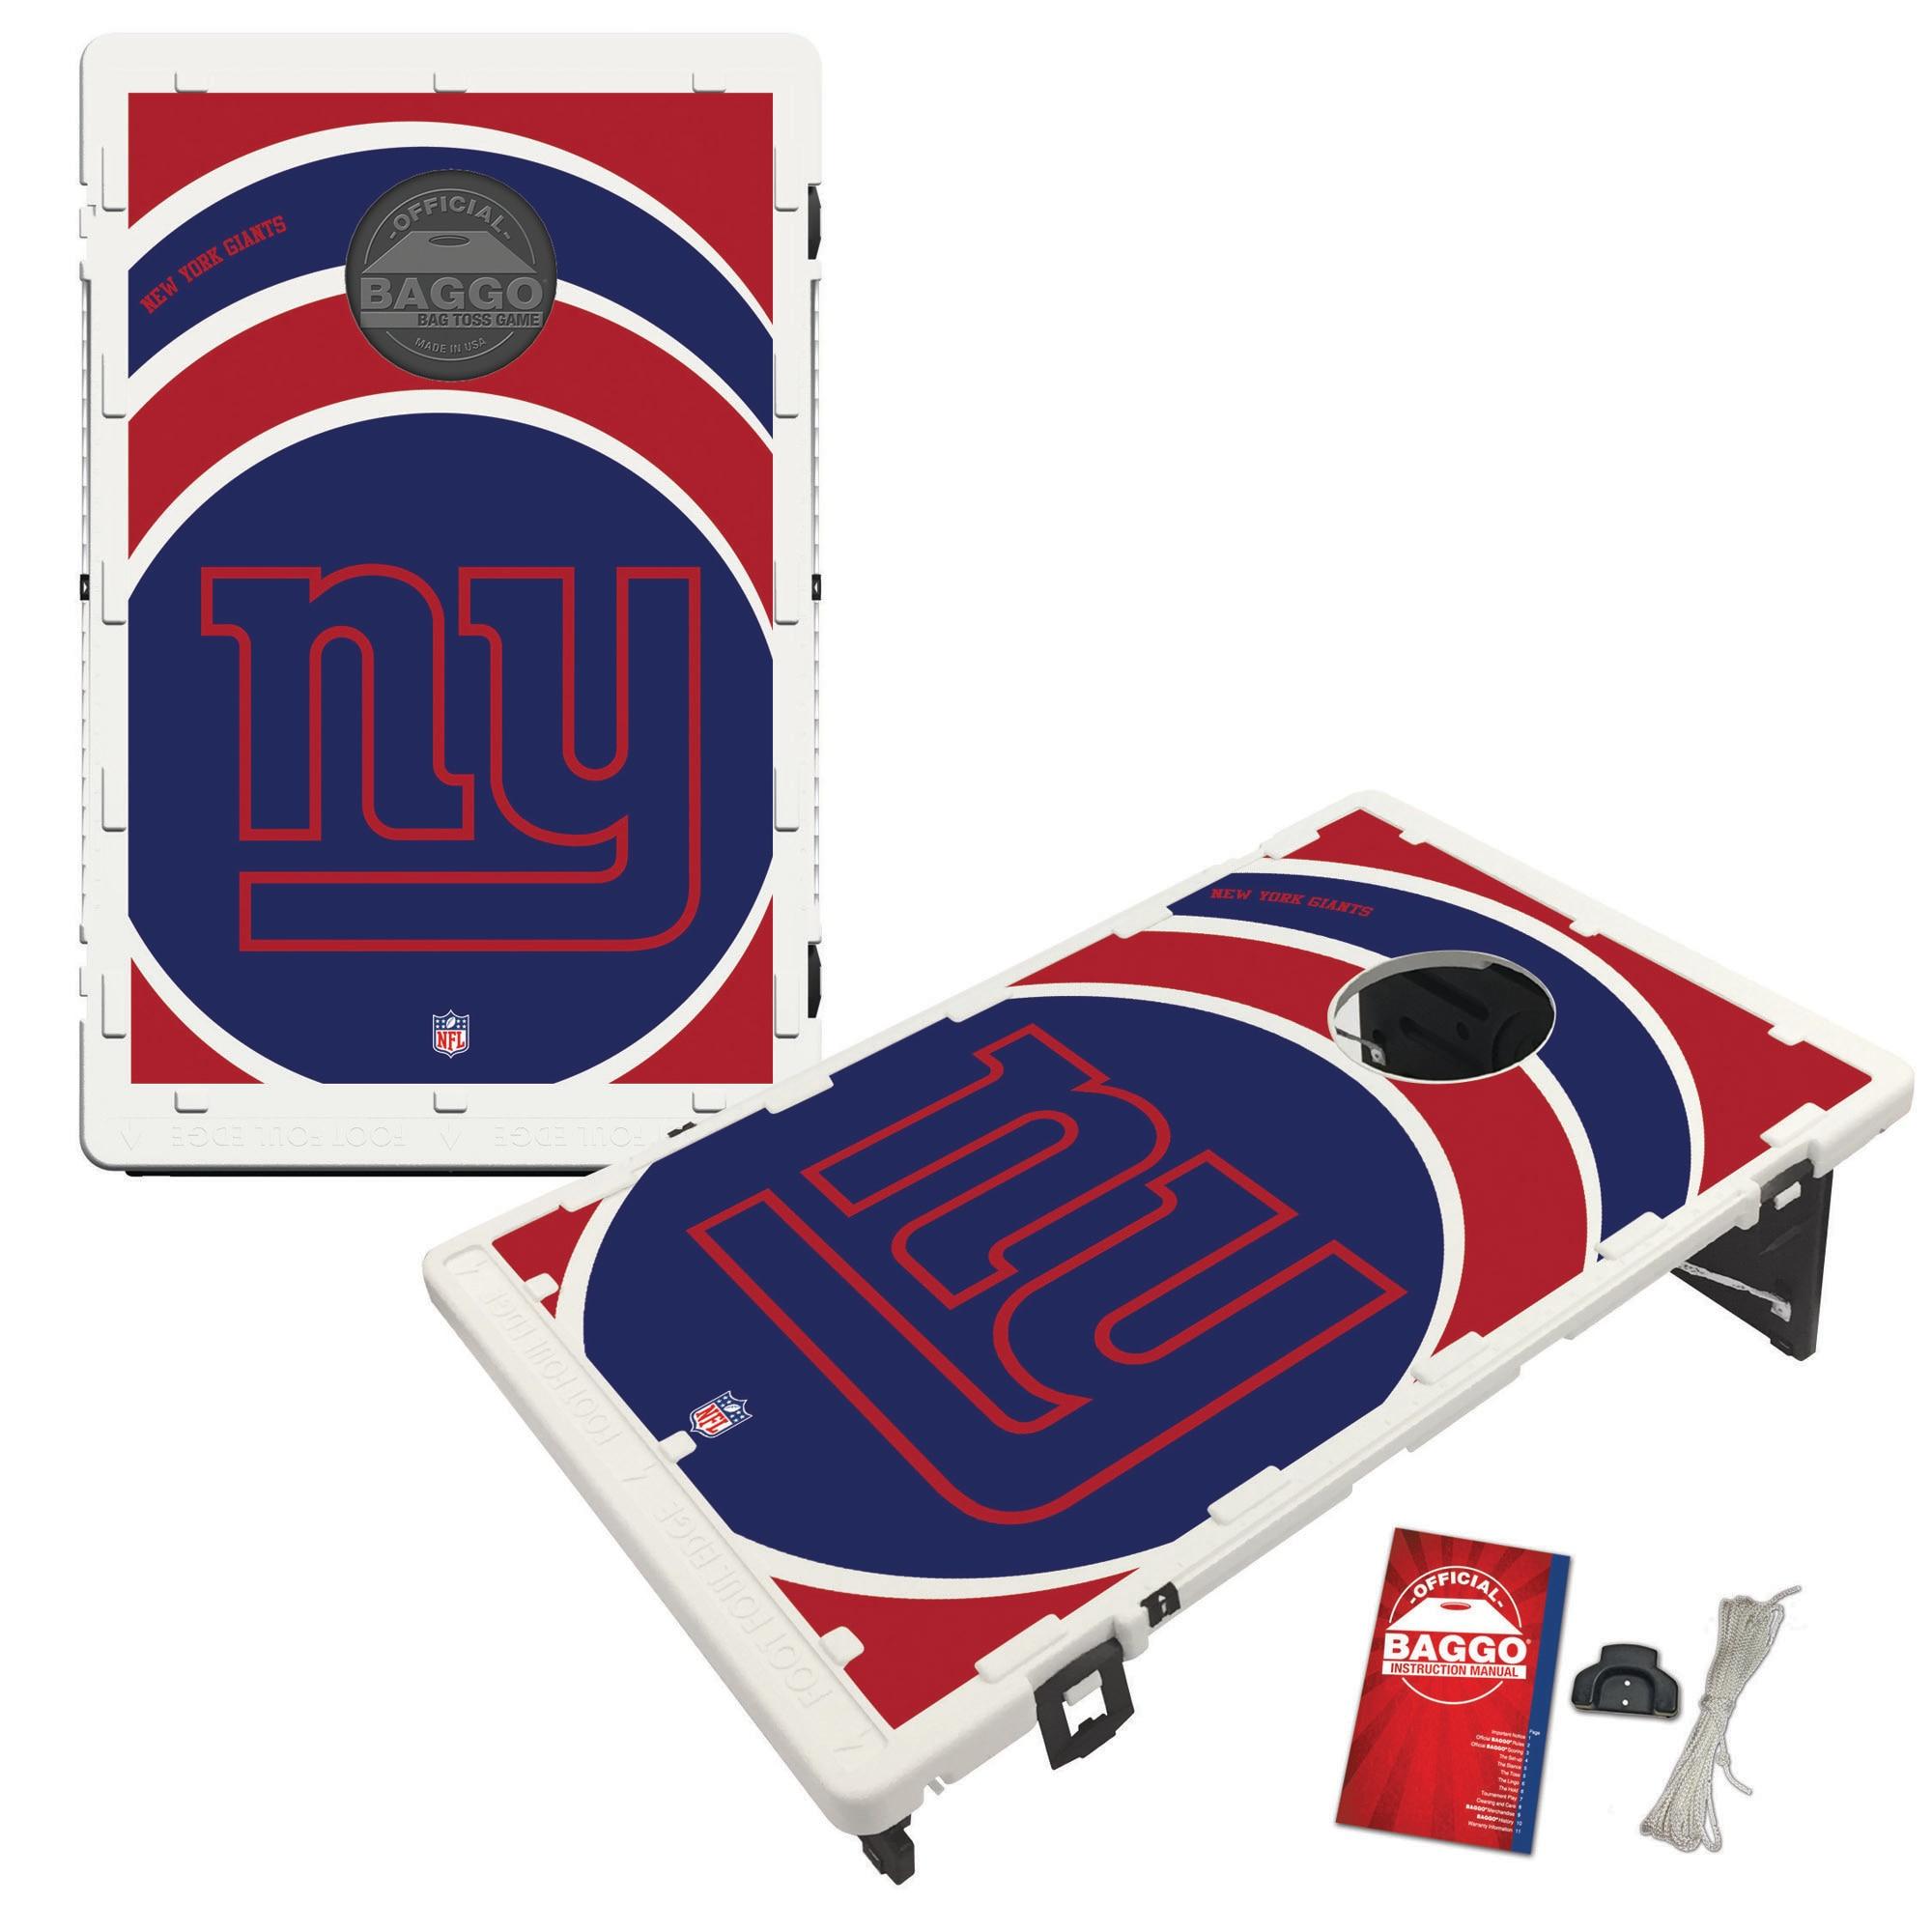 New York Giants 2' x 3' BAGGO Vortex Cornhole Board Tailgate Toss Set